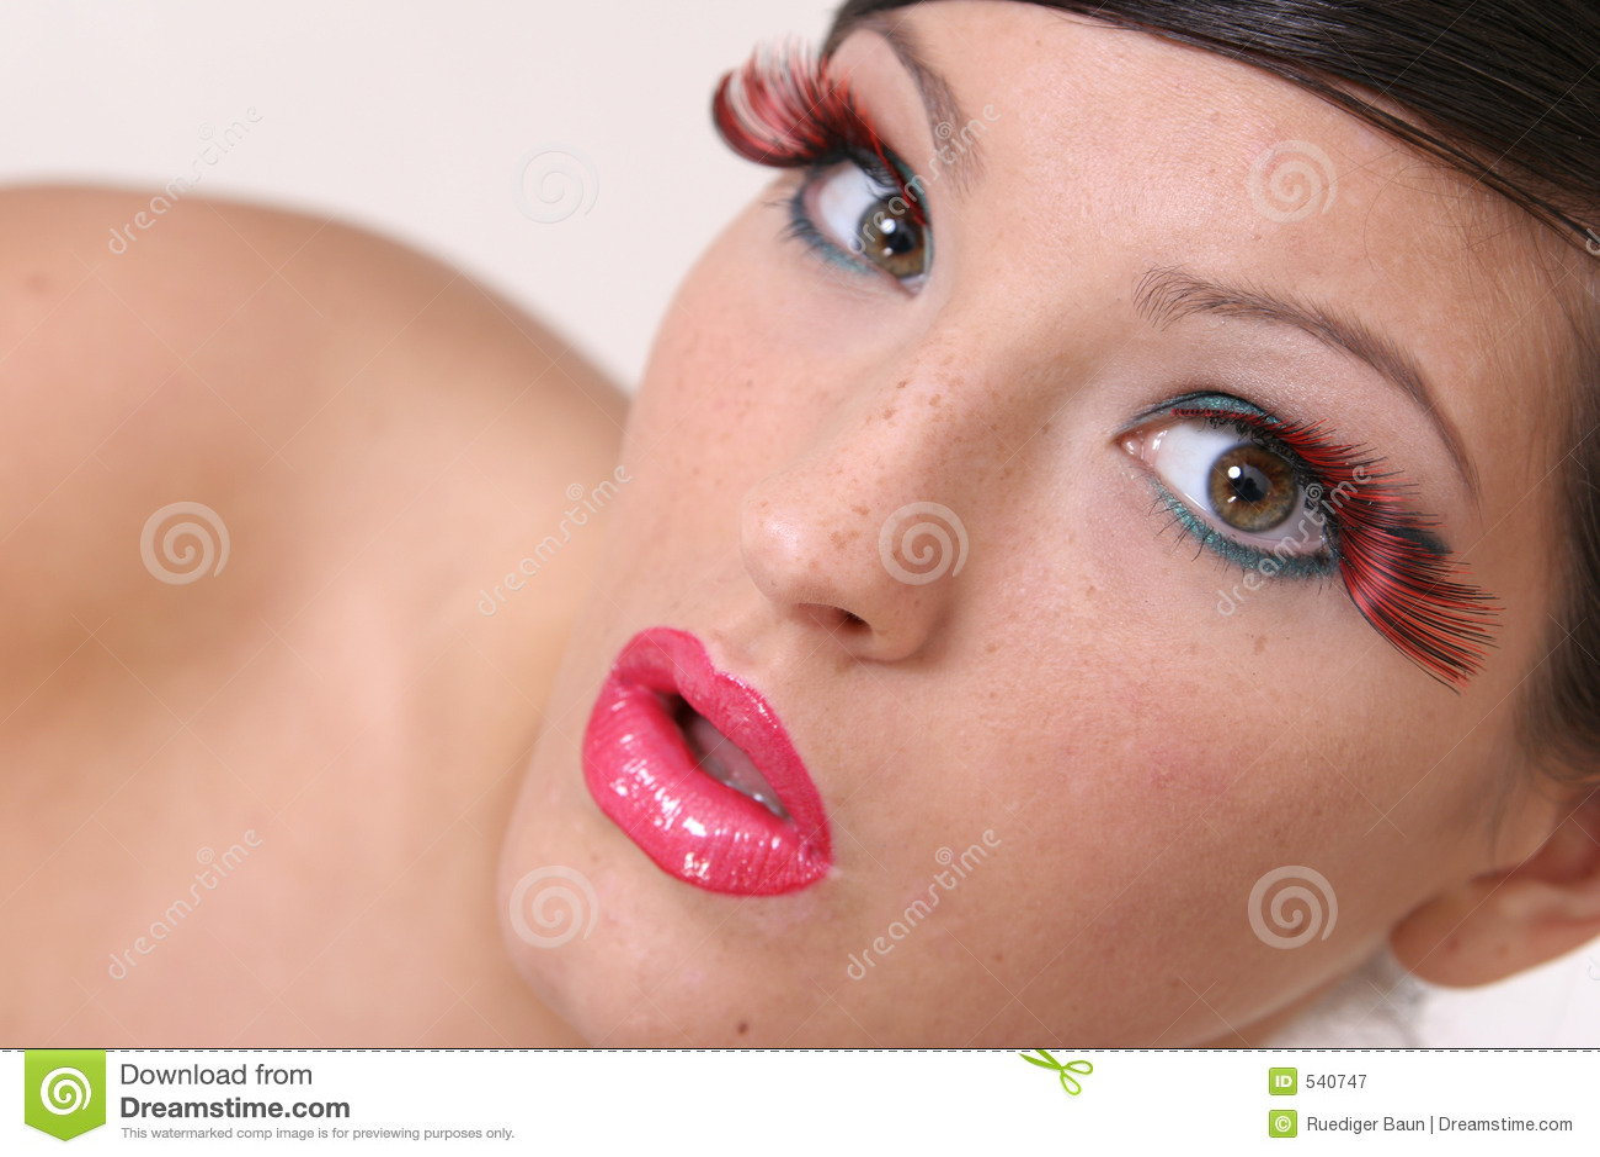 Фото девушека в рот 15 фотография